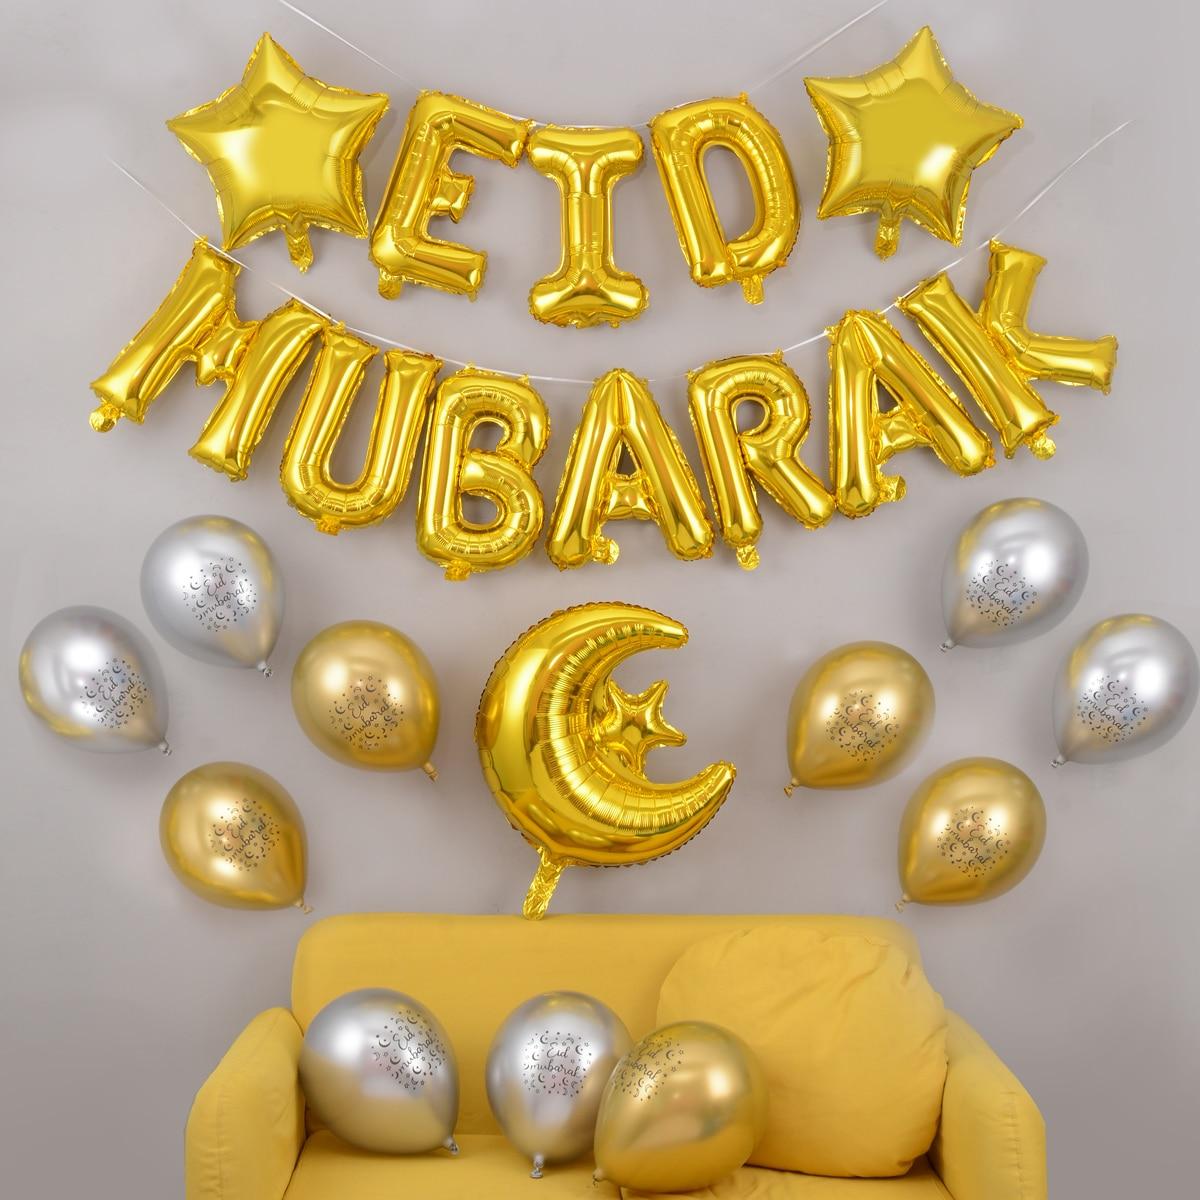 27pcs/Set Eid Mubarak Balloons Helium Latex Balloon Anniversaire Party Decoration Globo Aid Mubarak Decoration